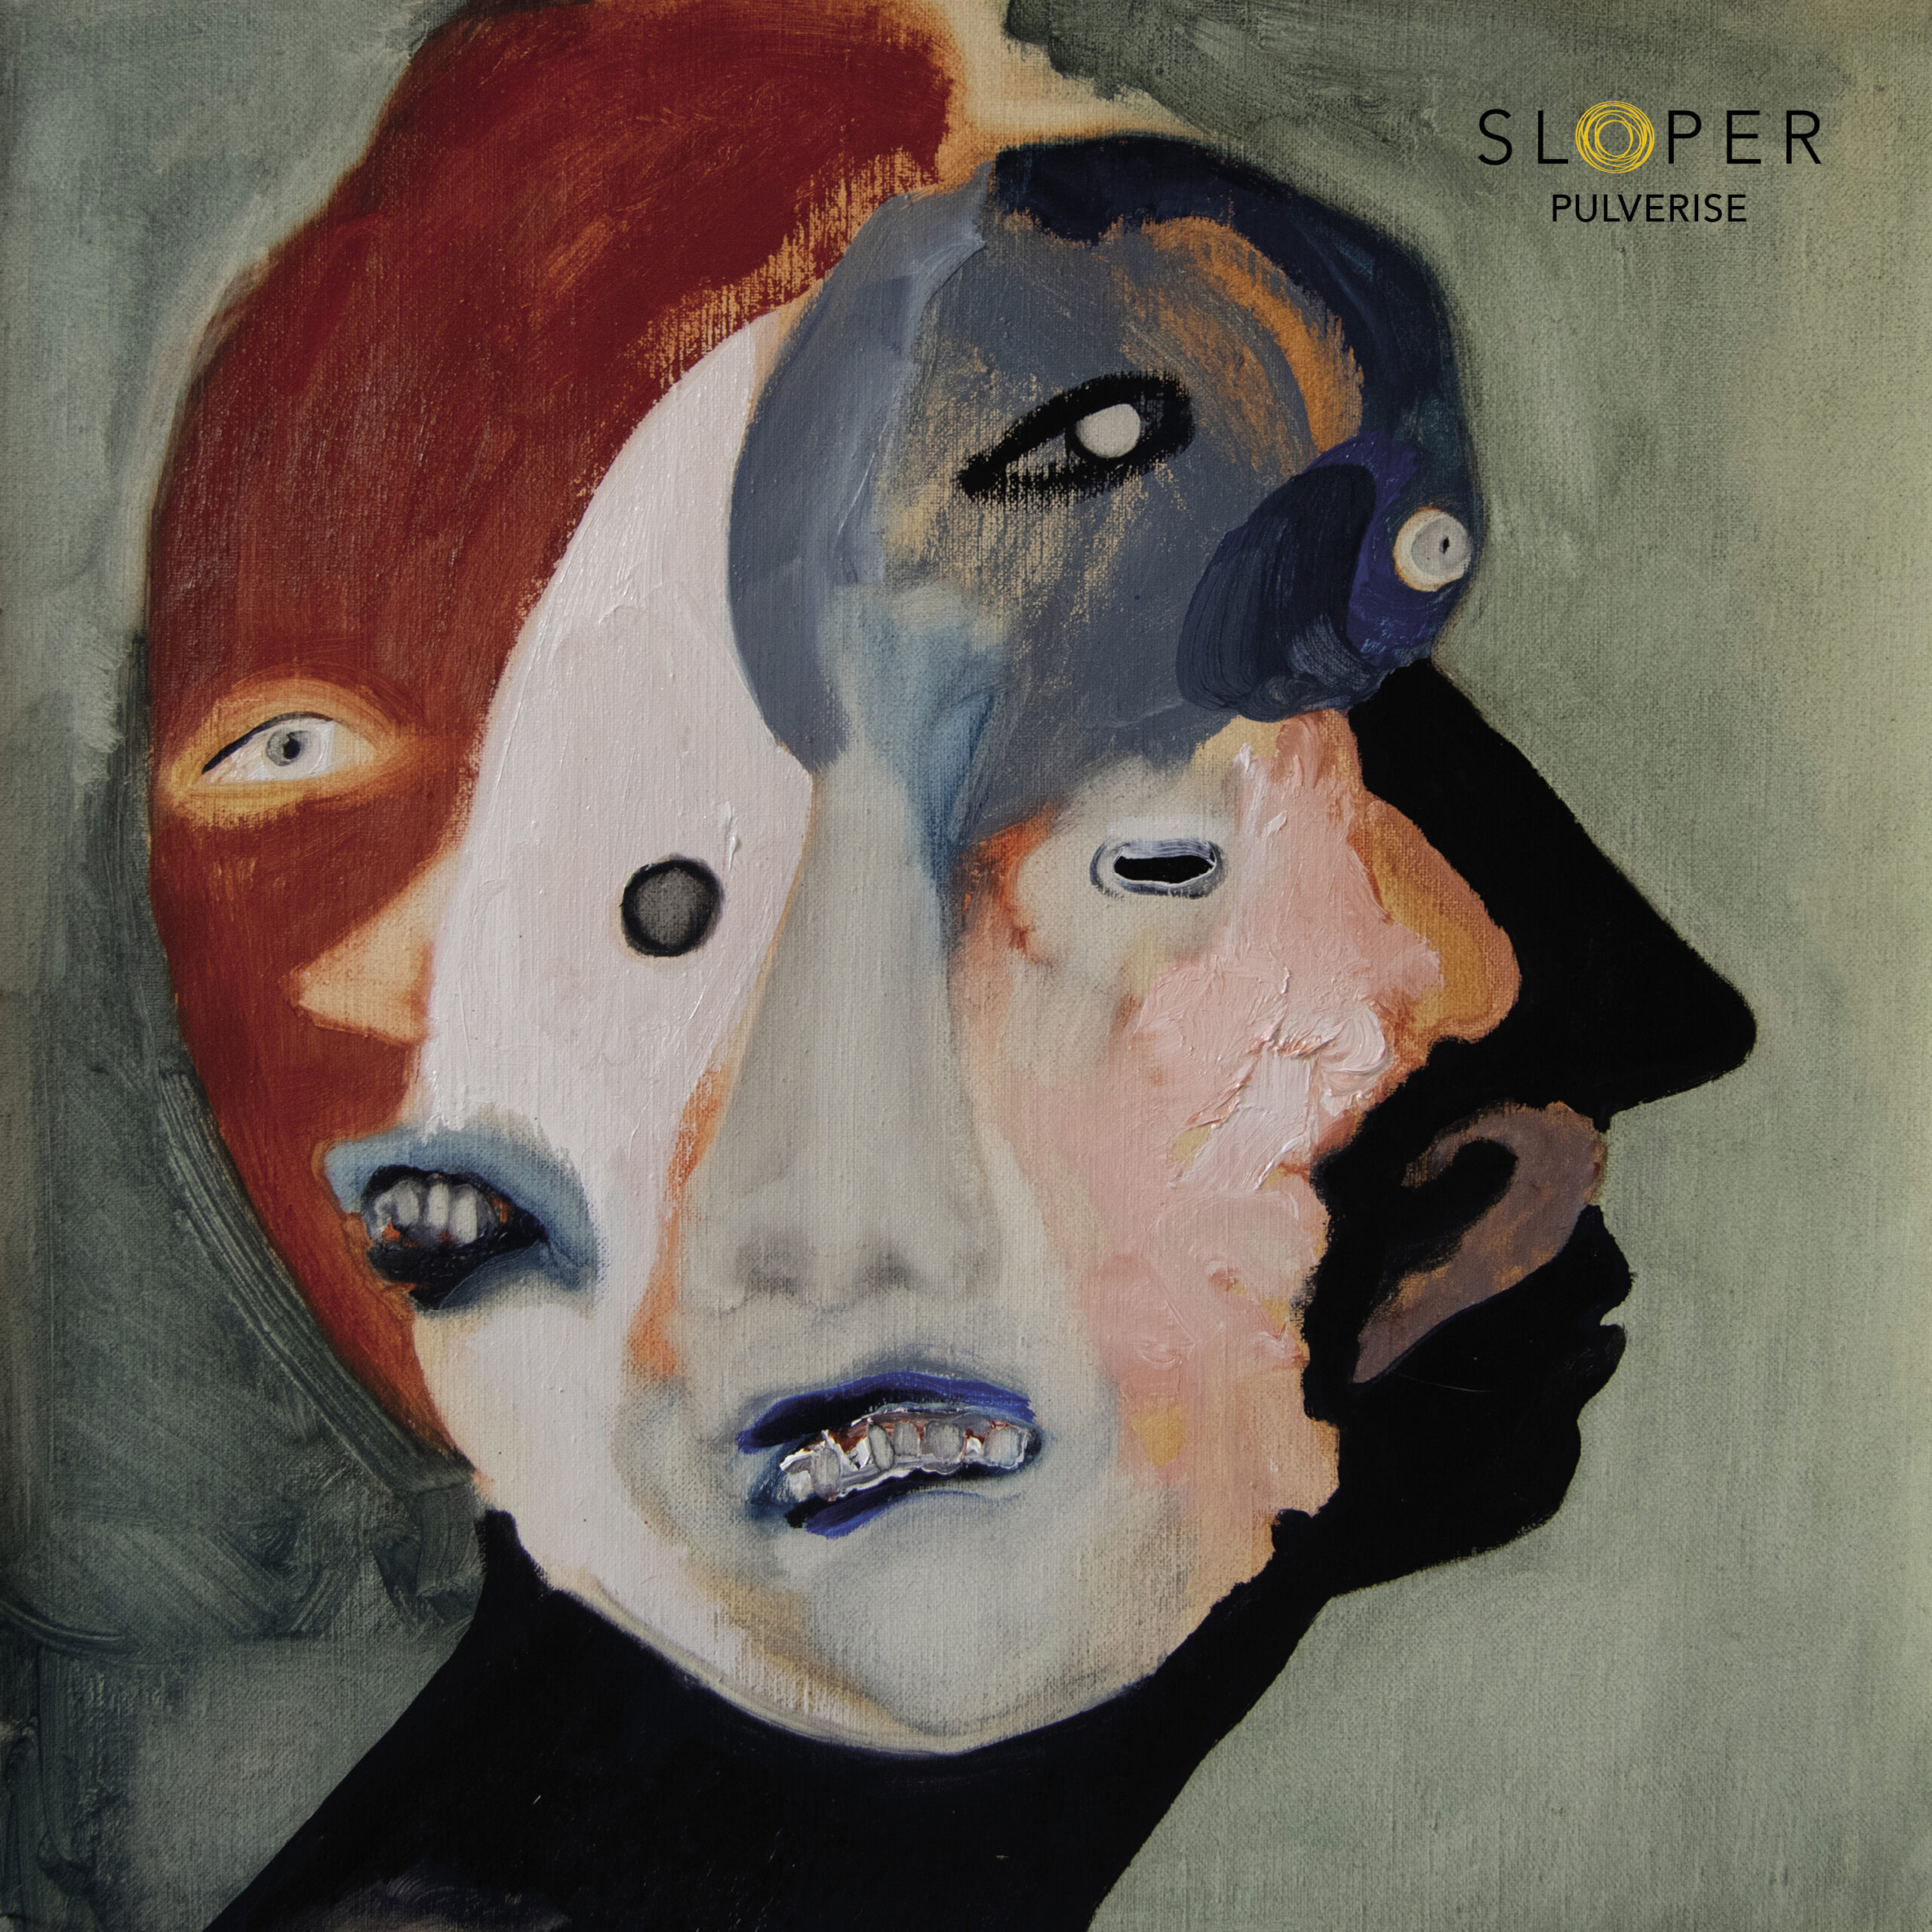 Sloper-Pulverise-Coverart